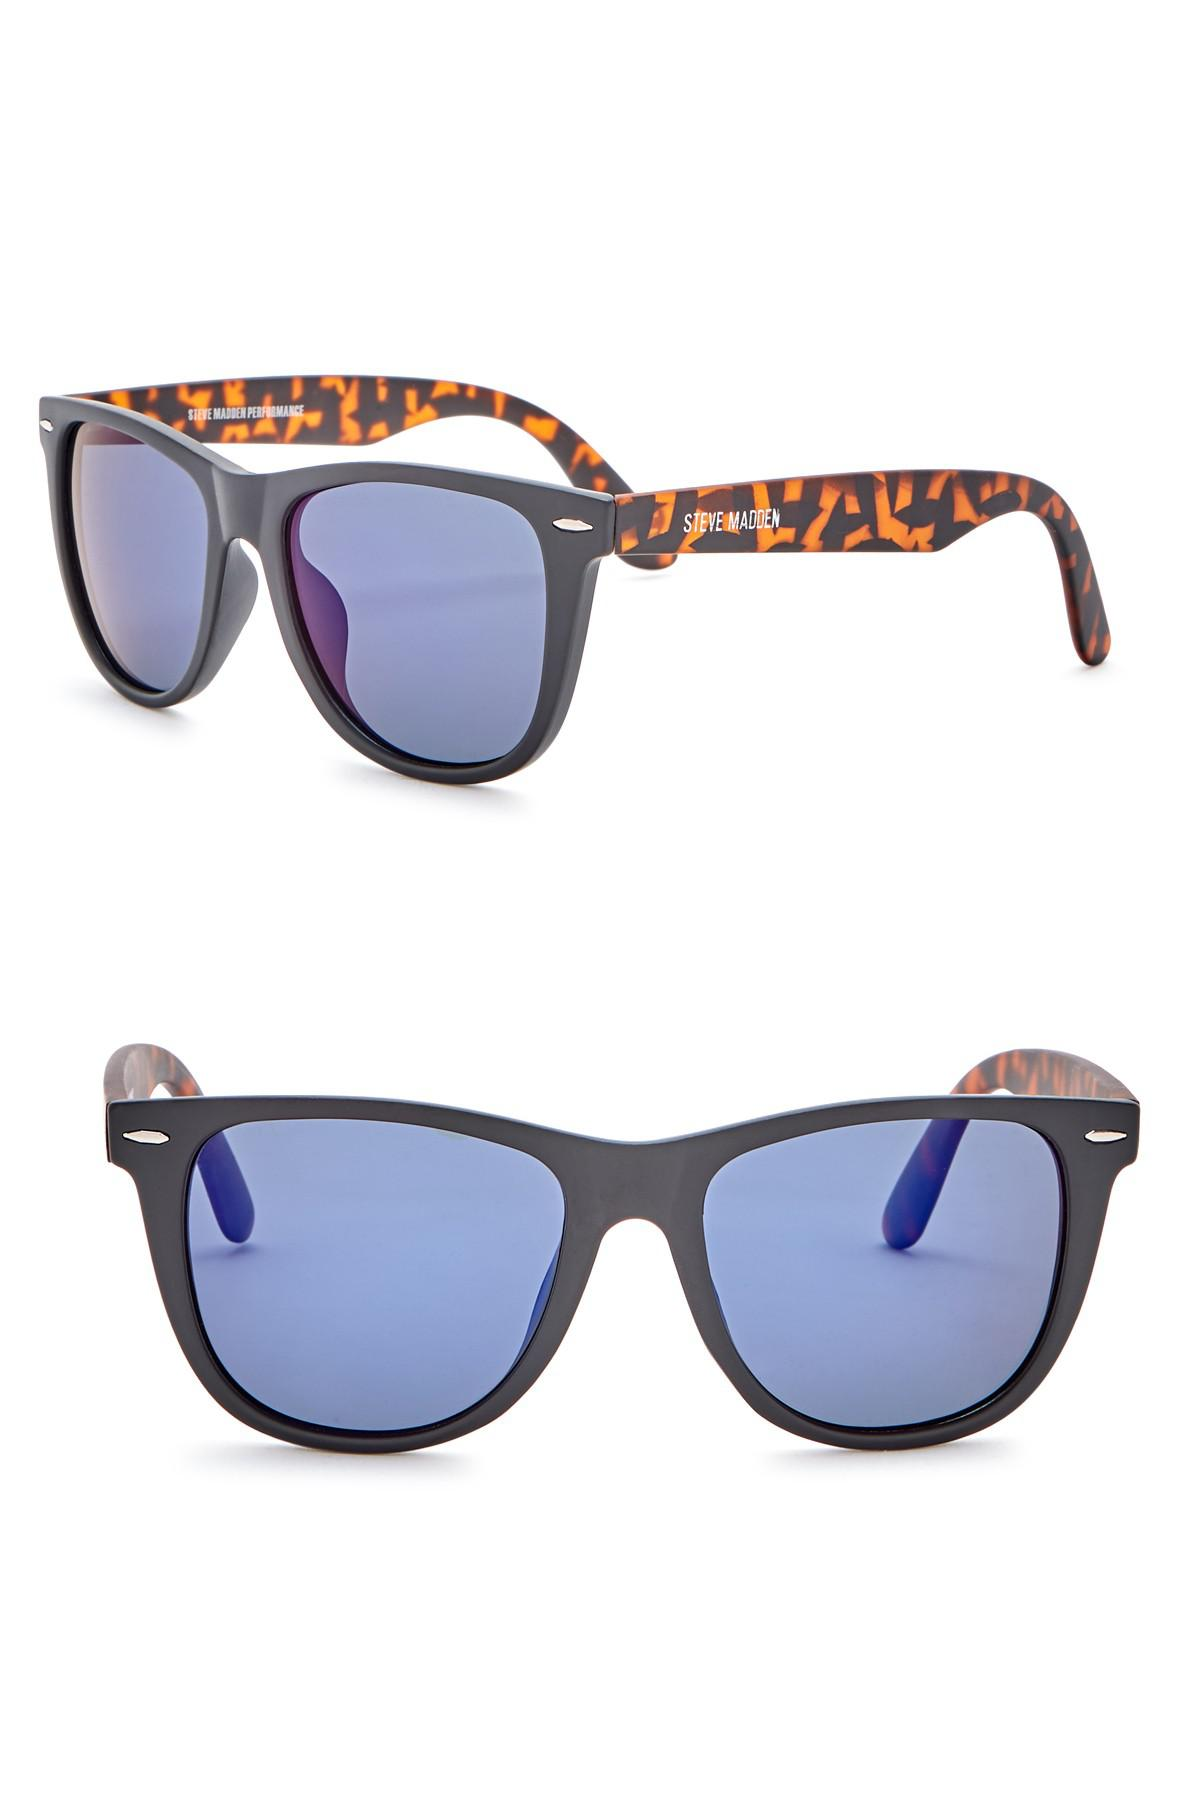 a871014106 Lyst - Steve Madden 54mm Square Polarized Acetate Frame Sunglasses ...